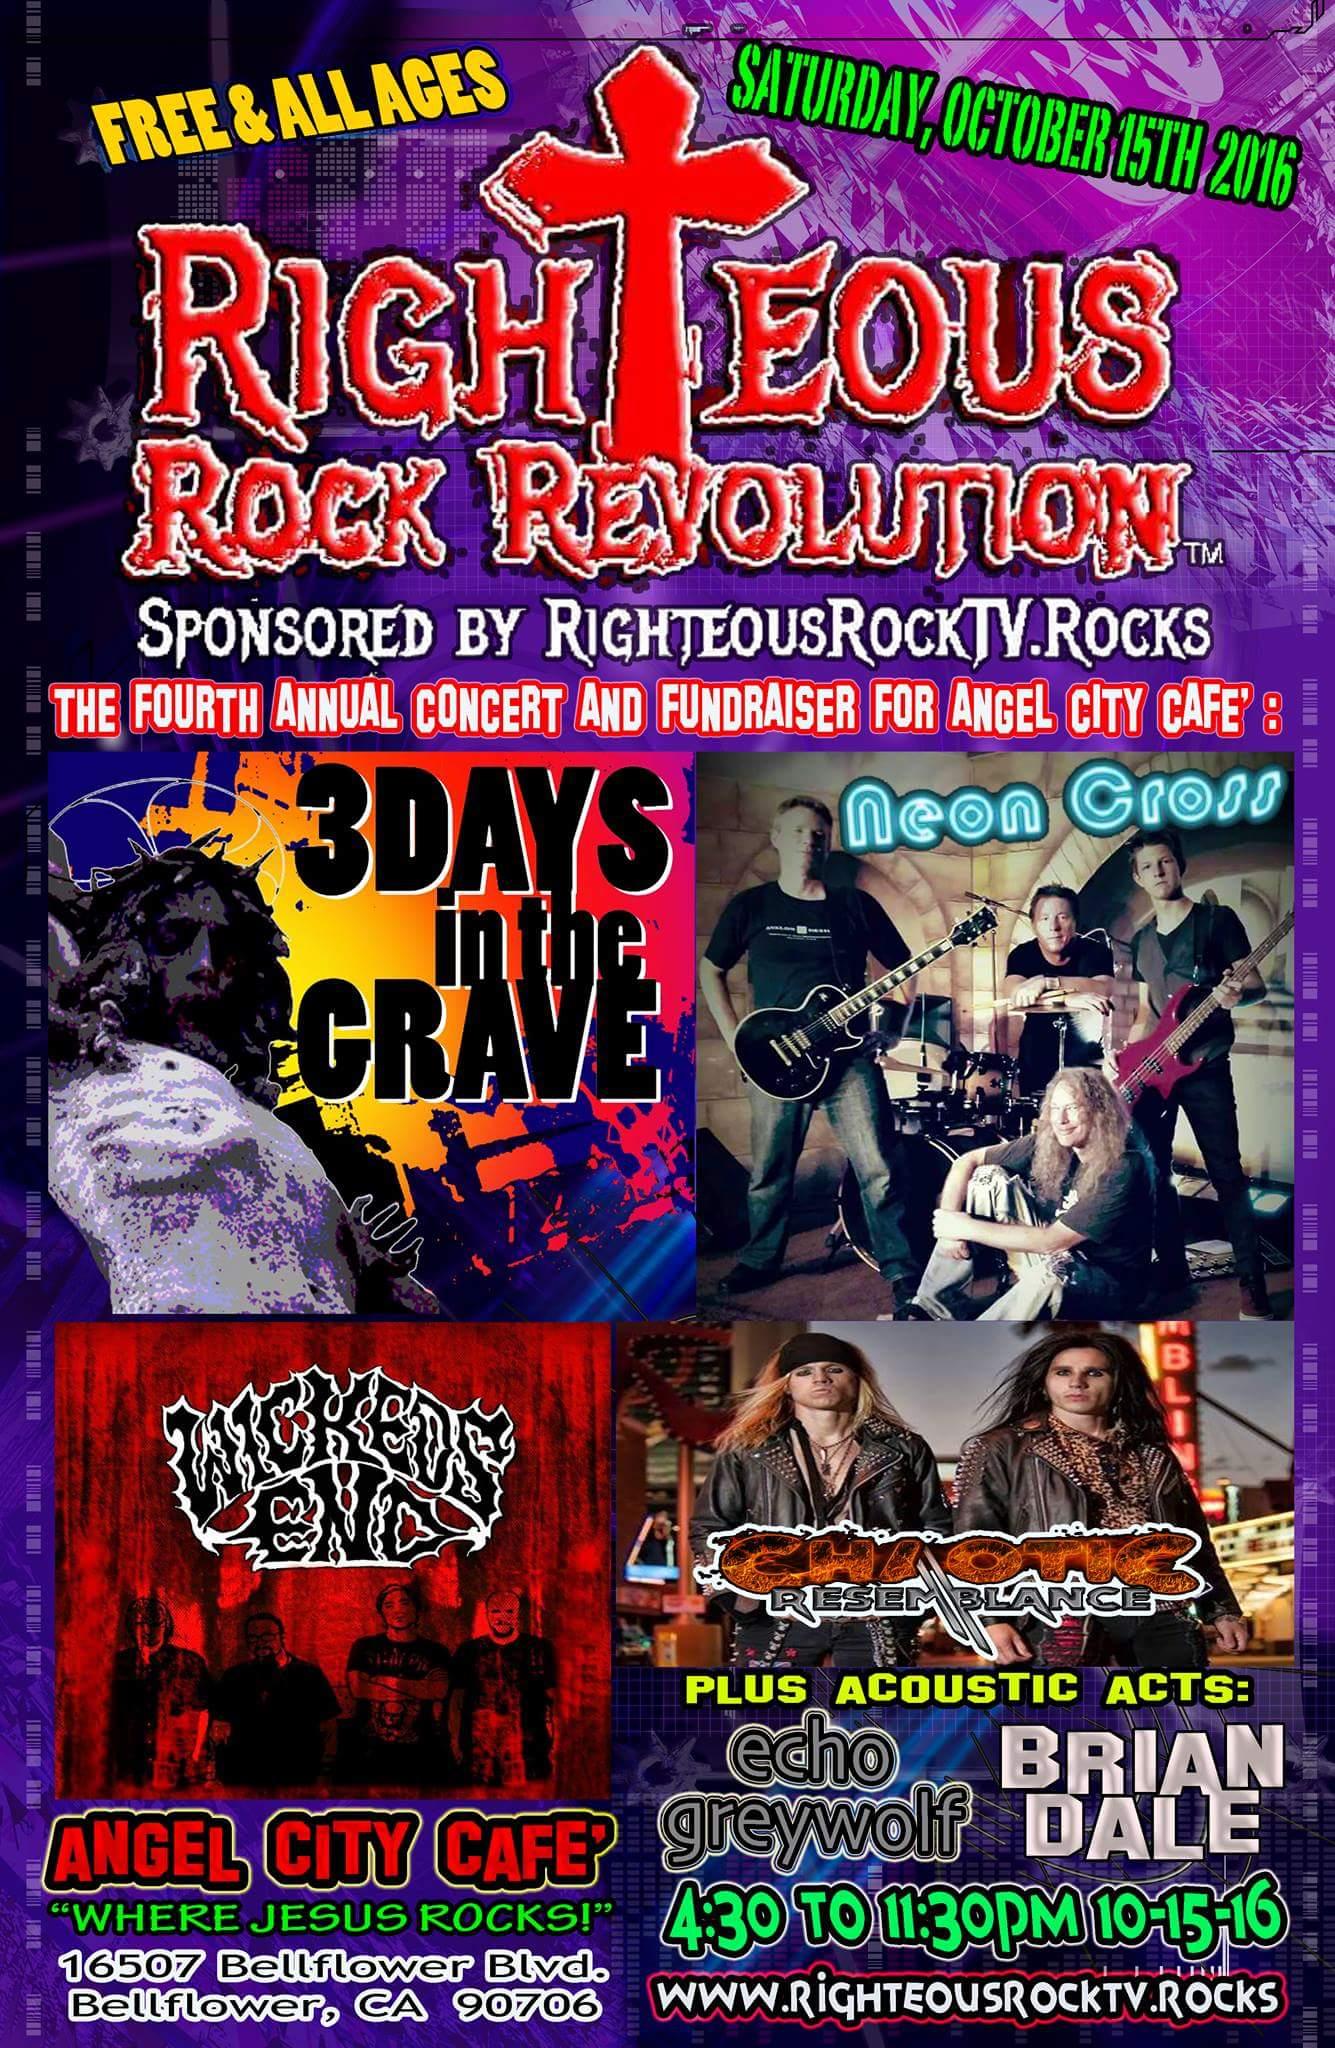 Righteous Rock Revolution